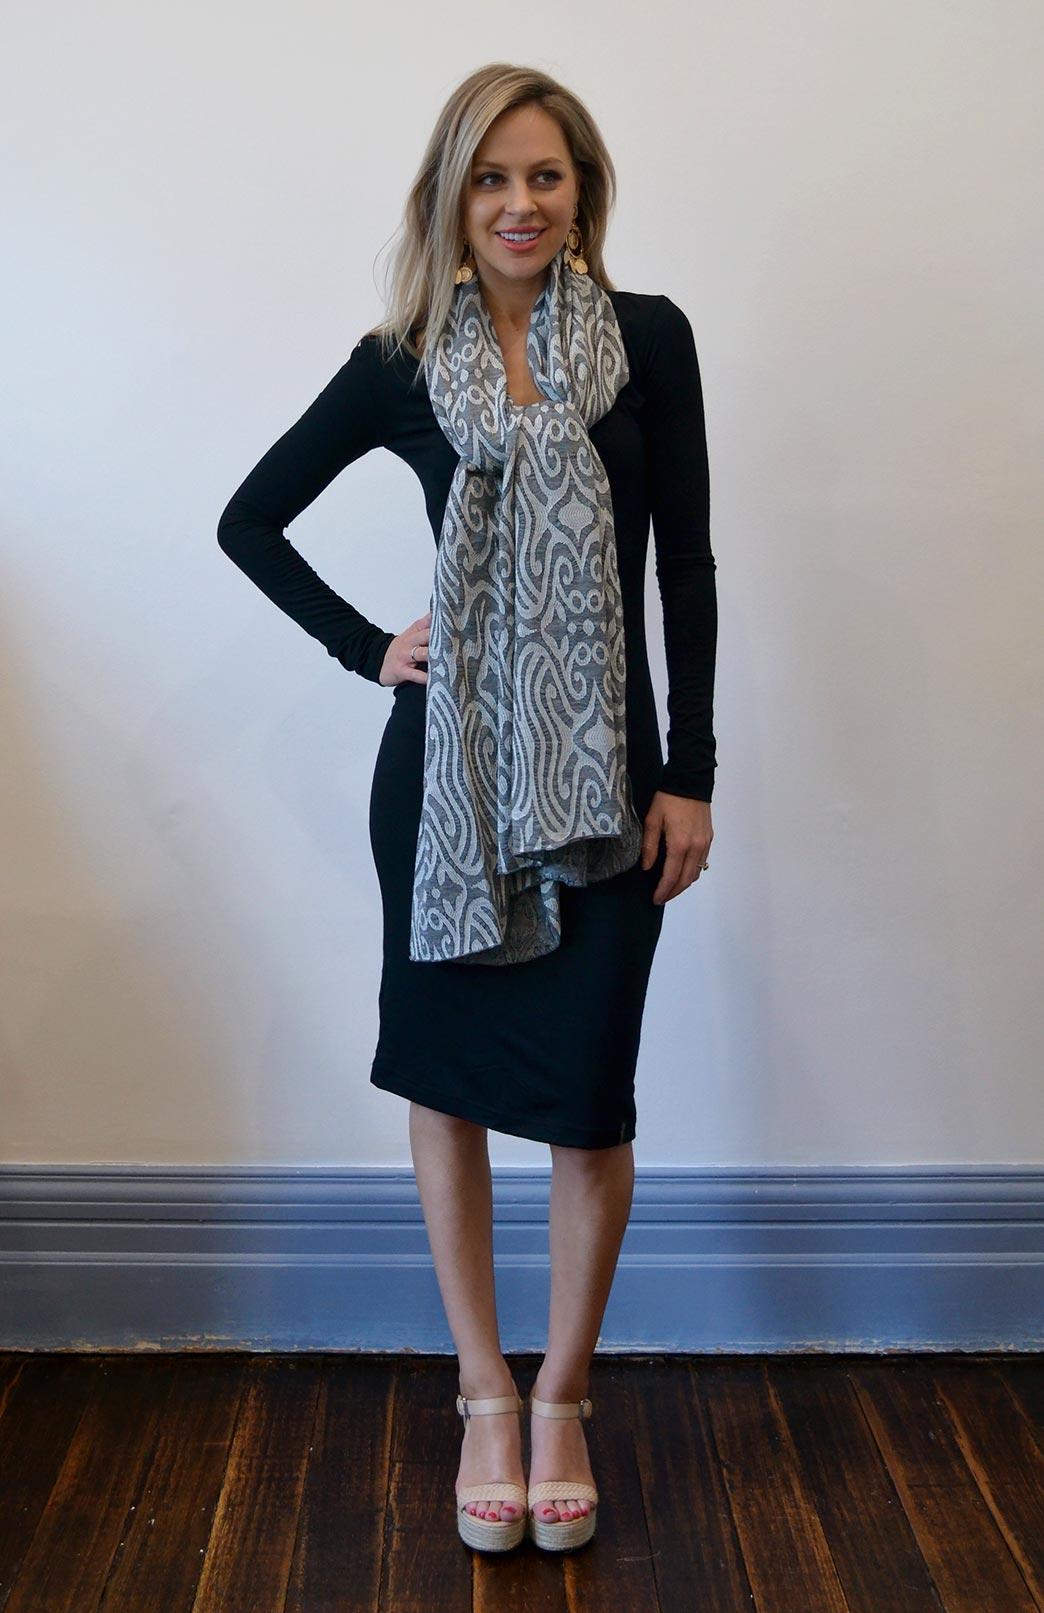 Patterned Wrap (Limited Edition) - Women's Superfine Merino Wool Patterned Wrap - Smitten Merino Tasmania Australia